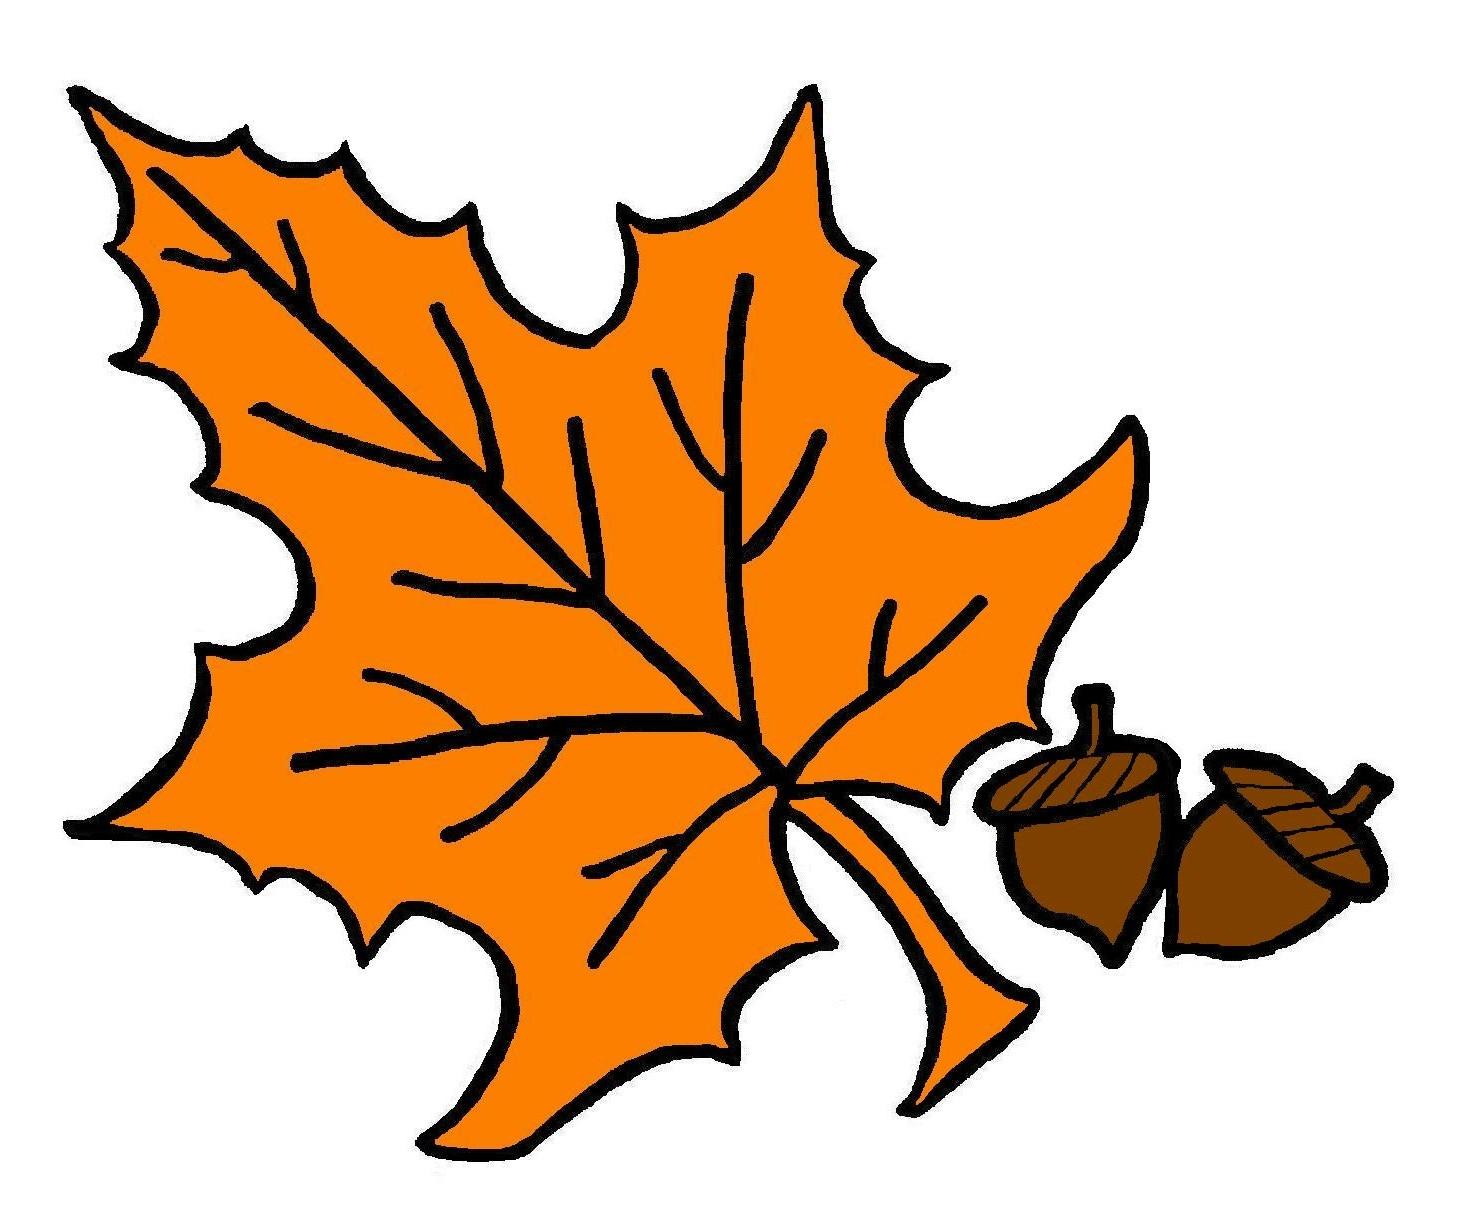 1457x1222 Top 93 Fall Leaves Clip Art